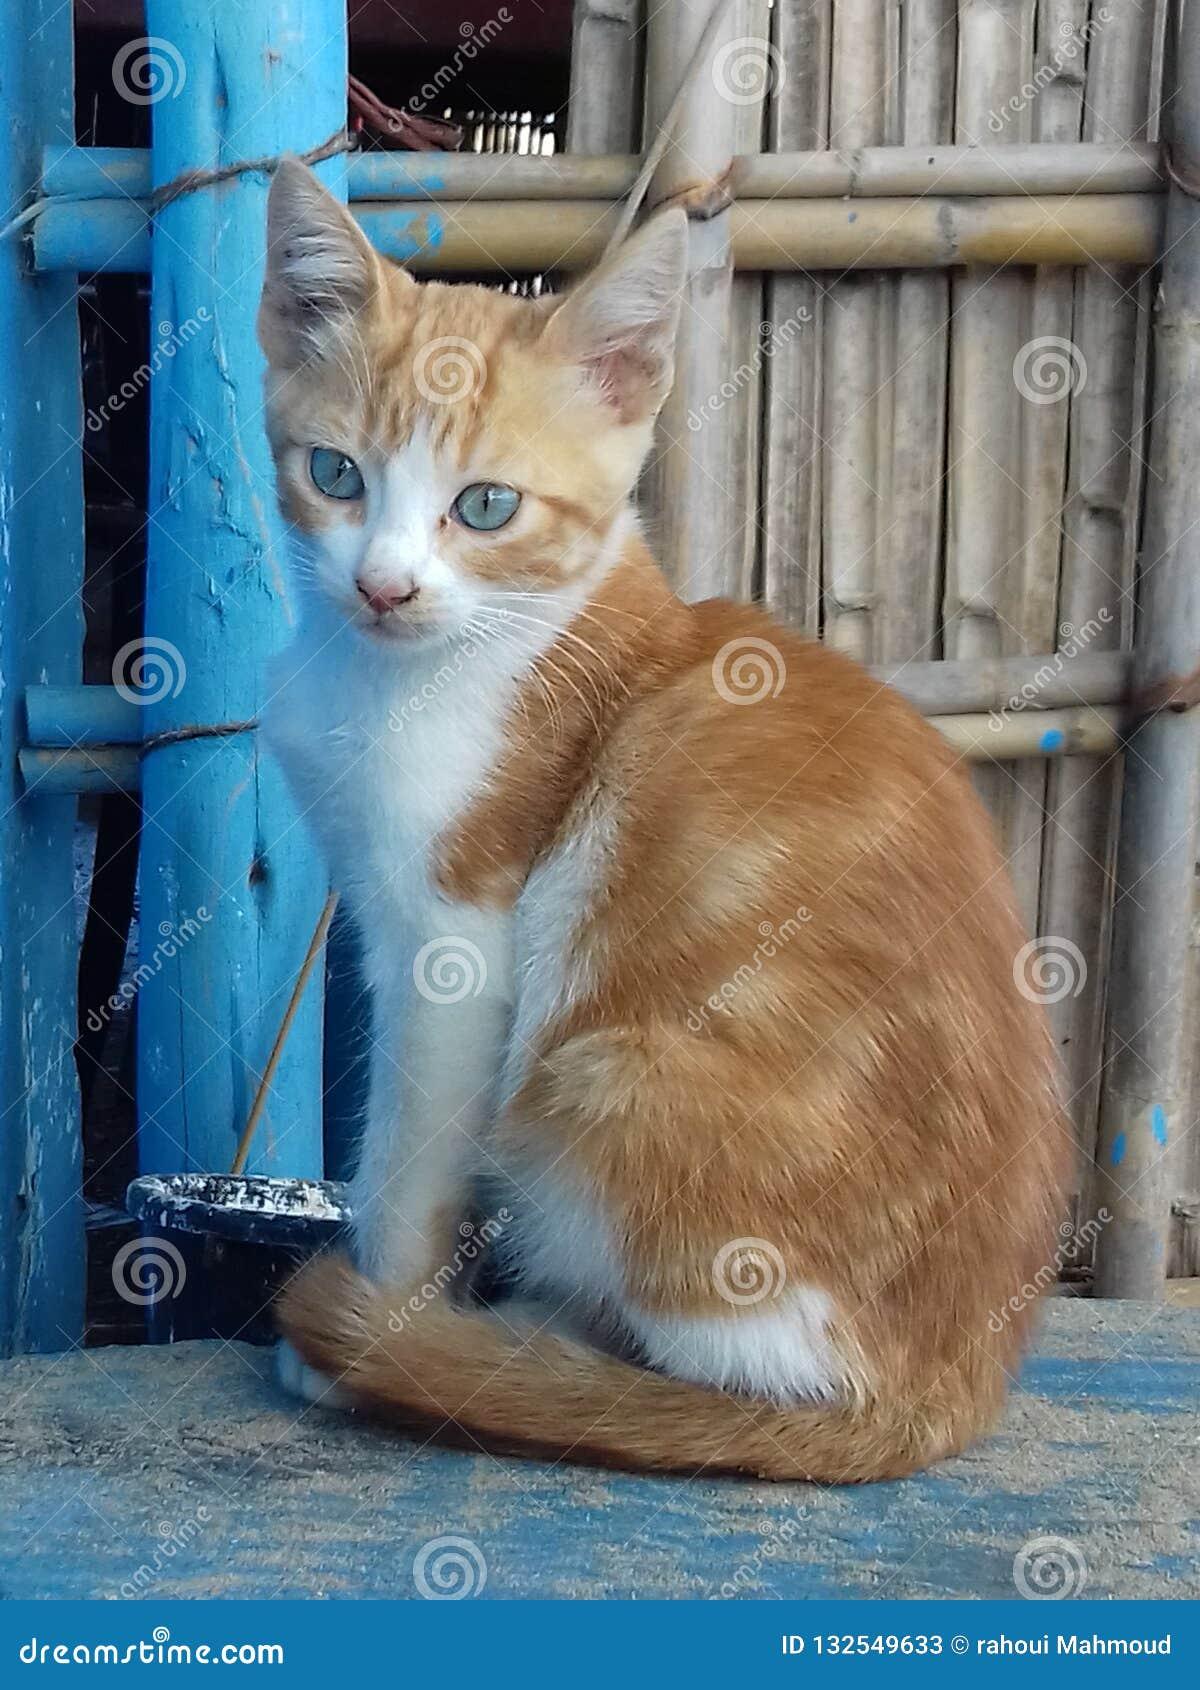 chat marocain sans inscription